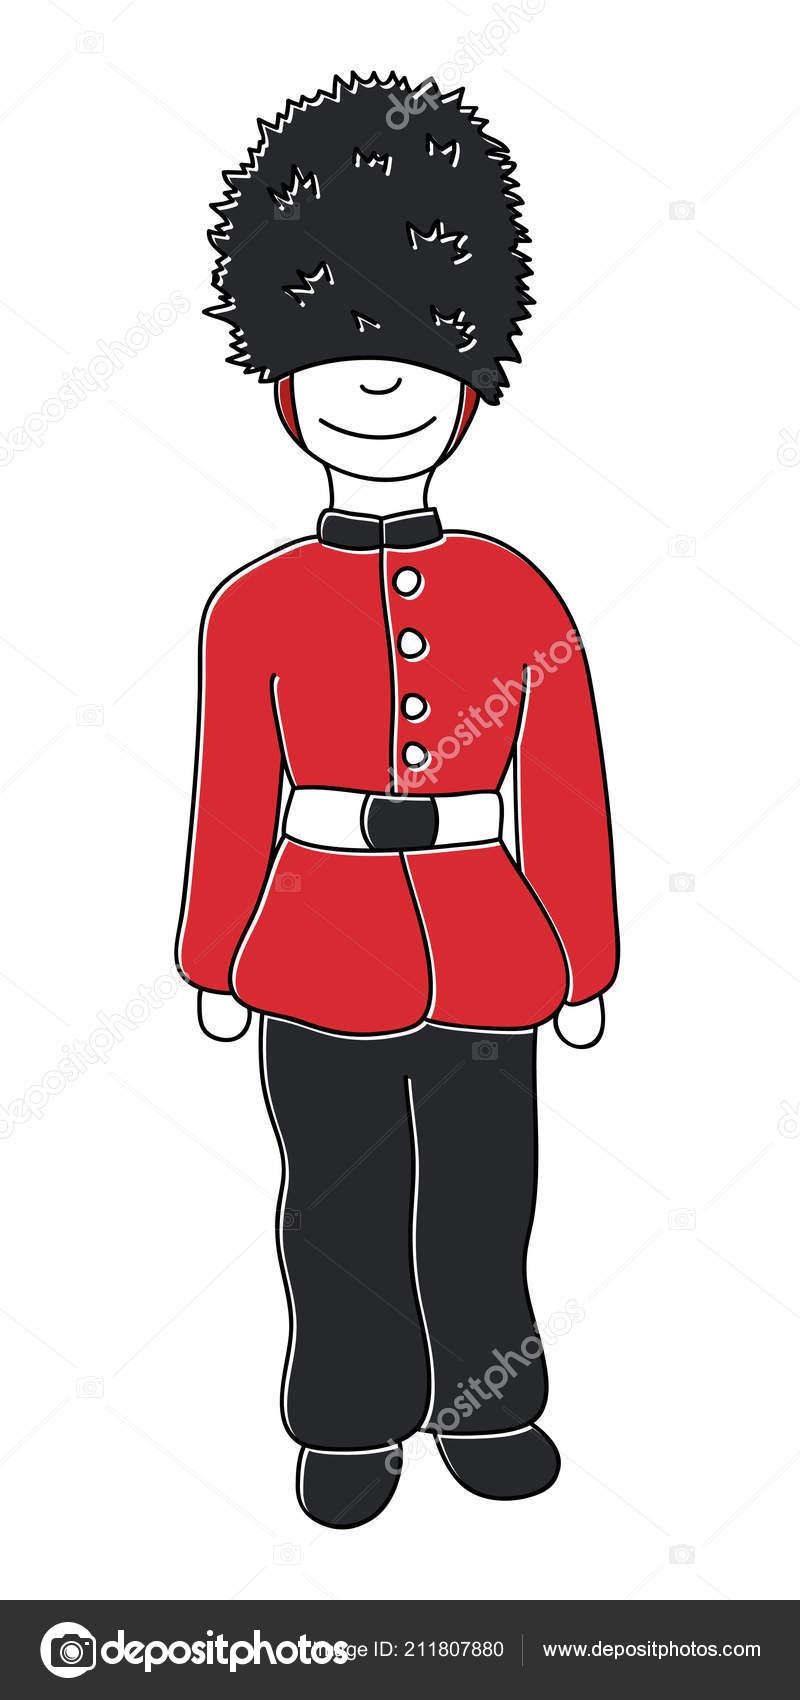 Avant Garde Royal London Vecteur Dessin Main Attractions